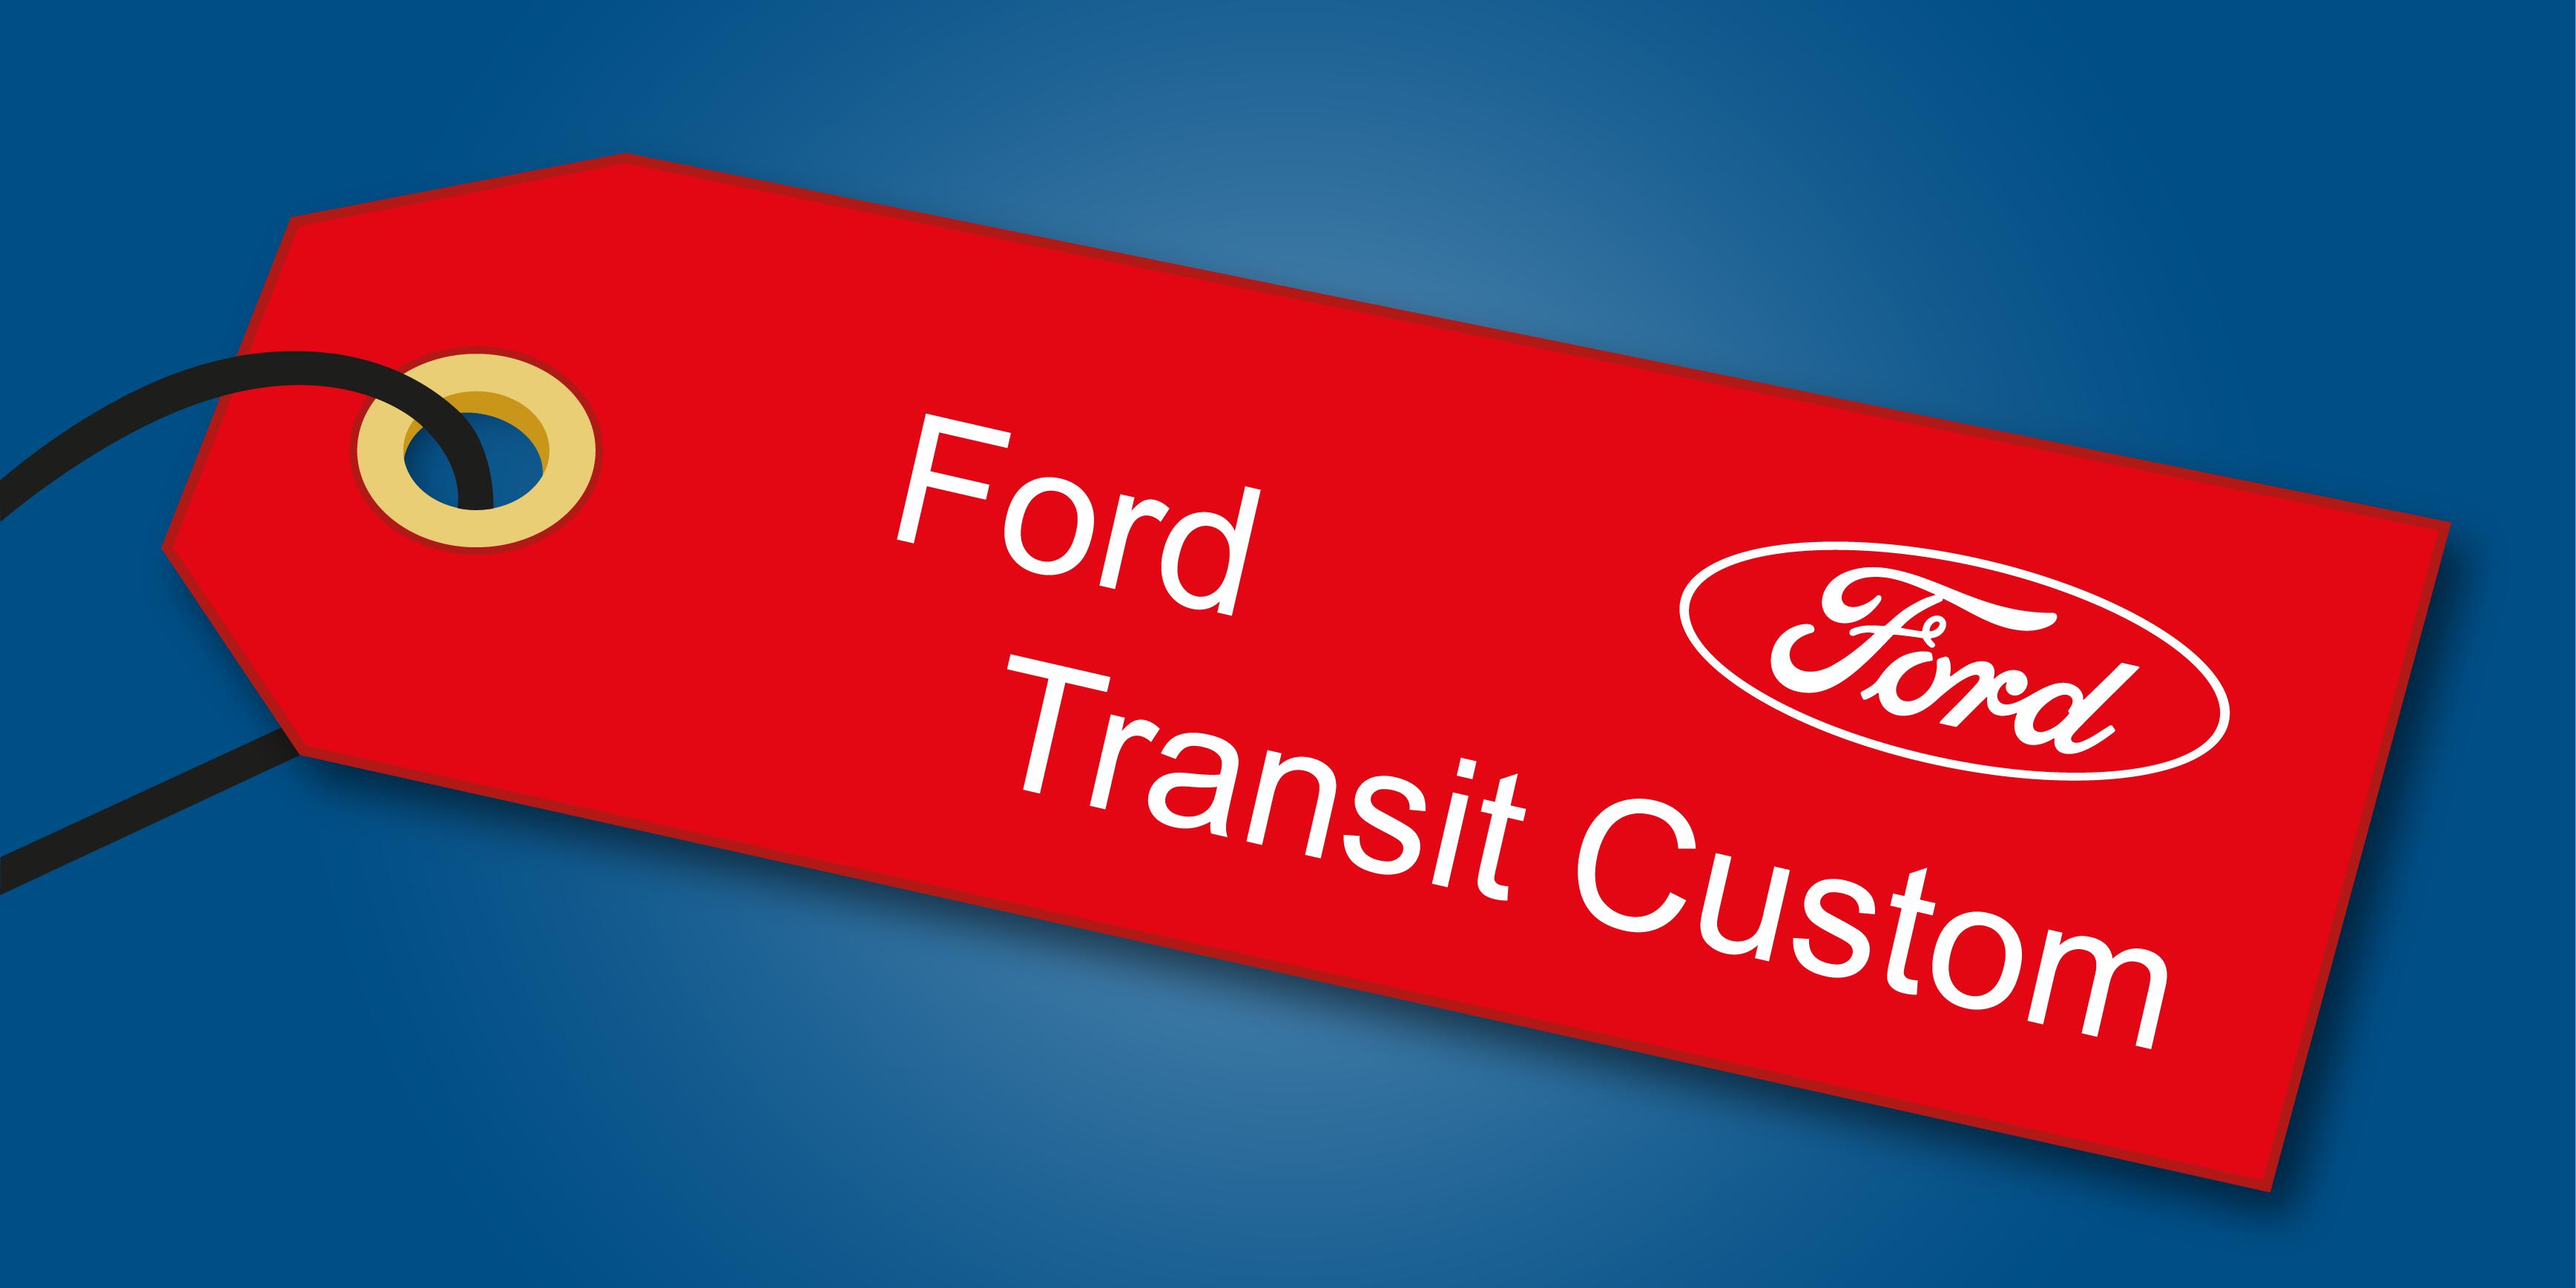 Ford Gewerbewochen bei Auto Jochem - Angebot Ford Transit Custom